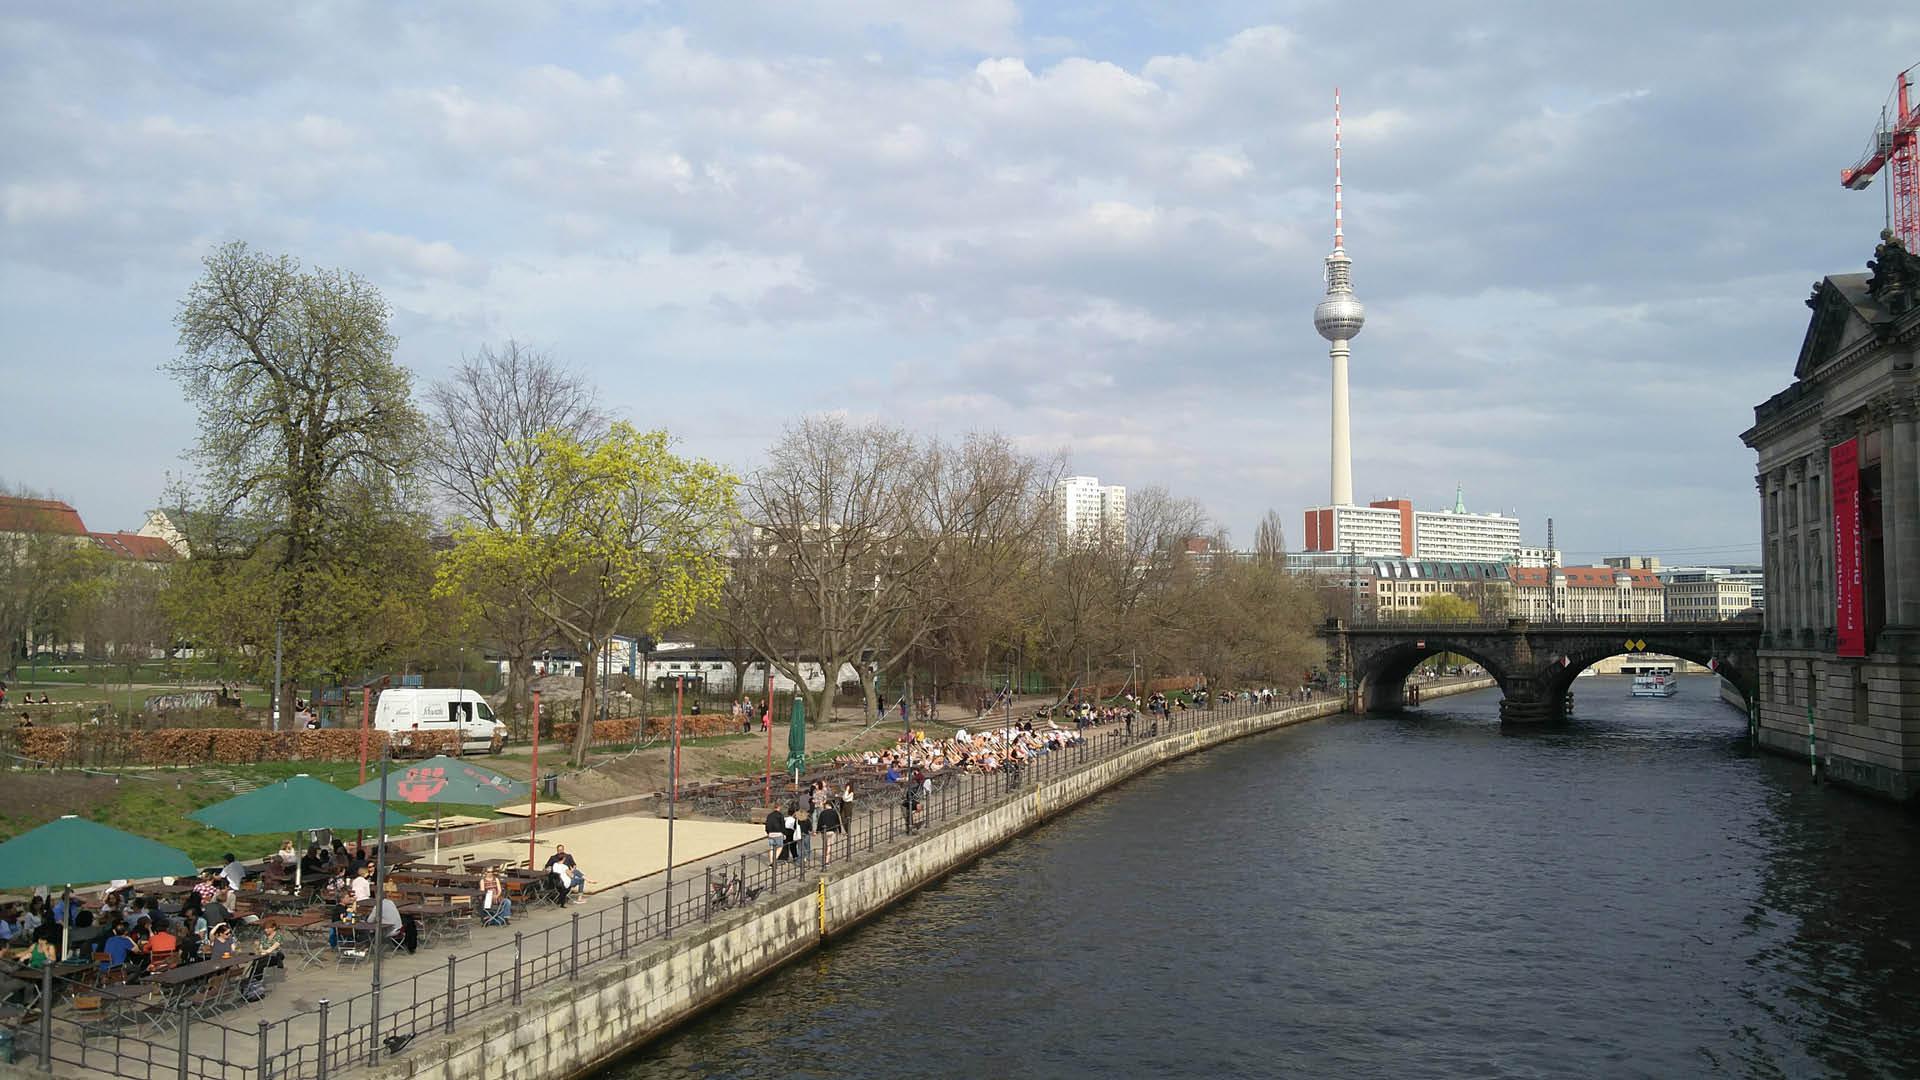 08 18 6 Exkursion Berlin